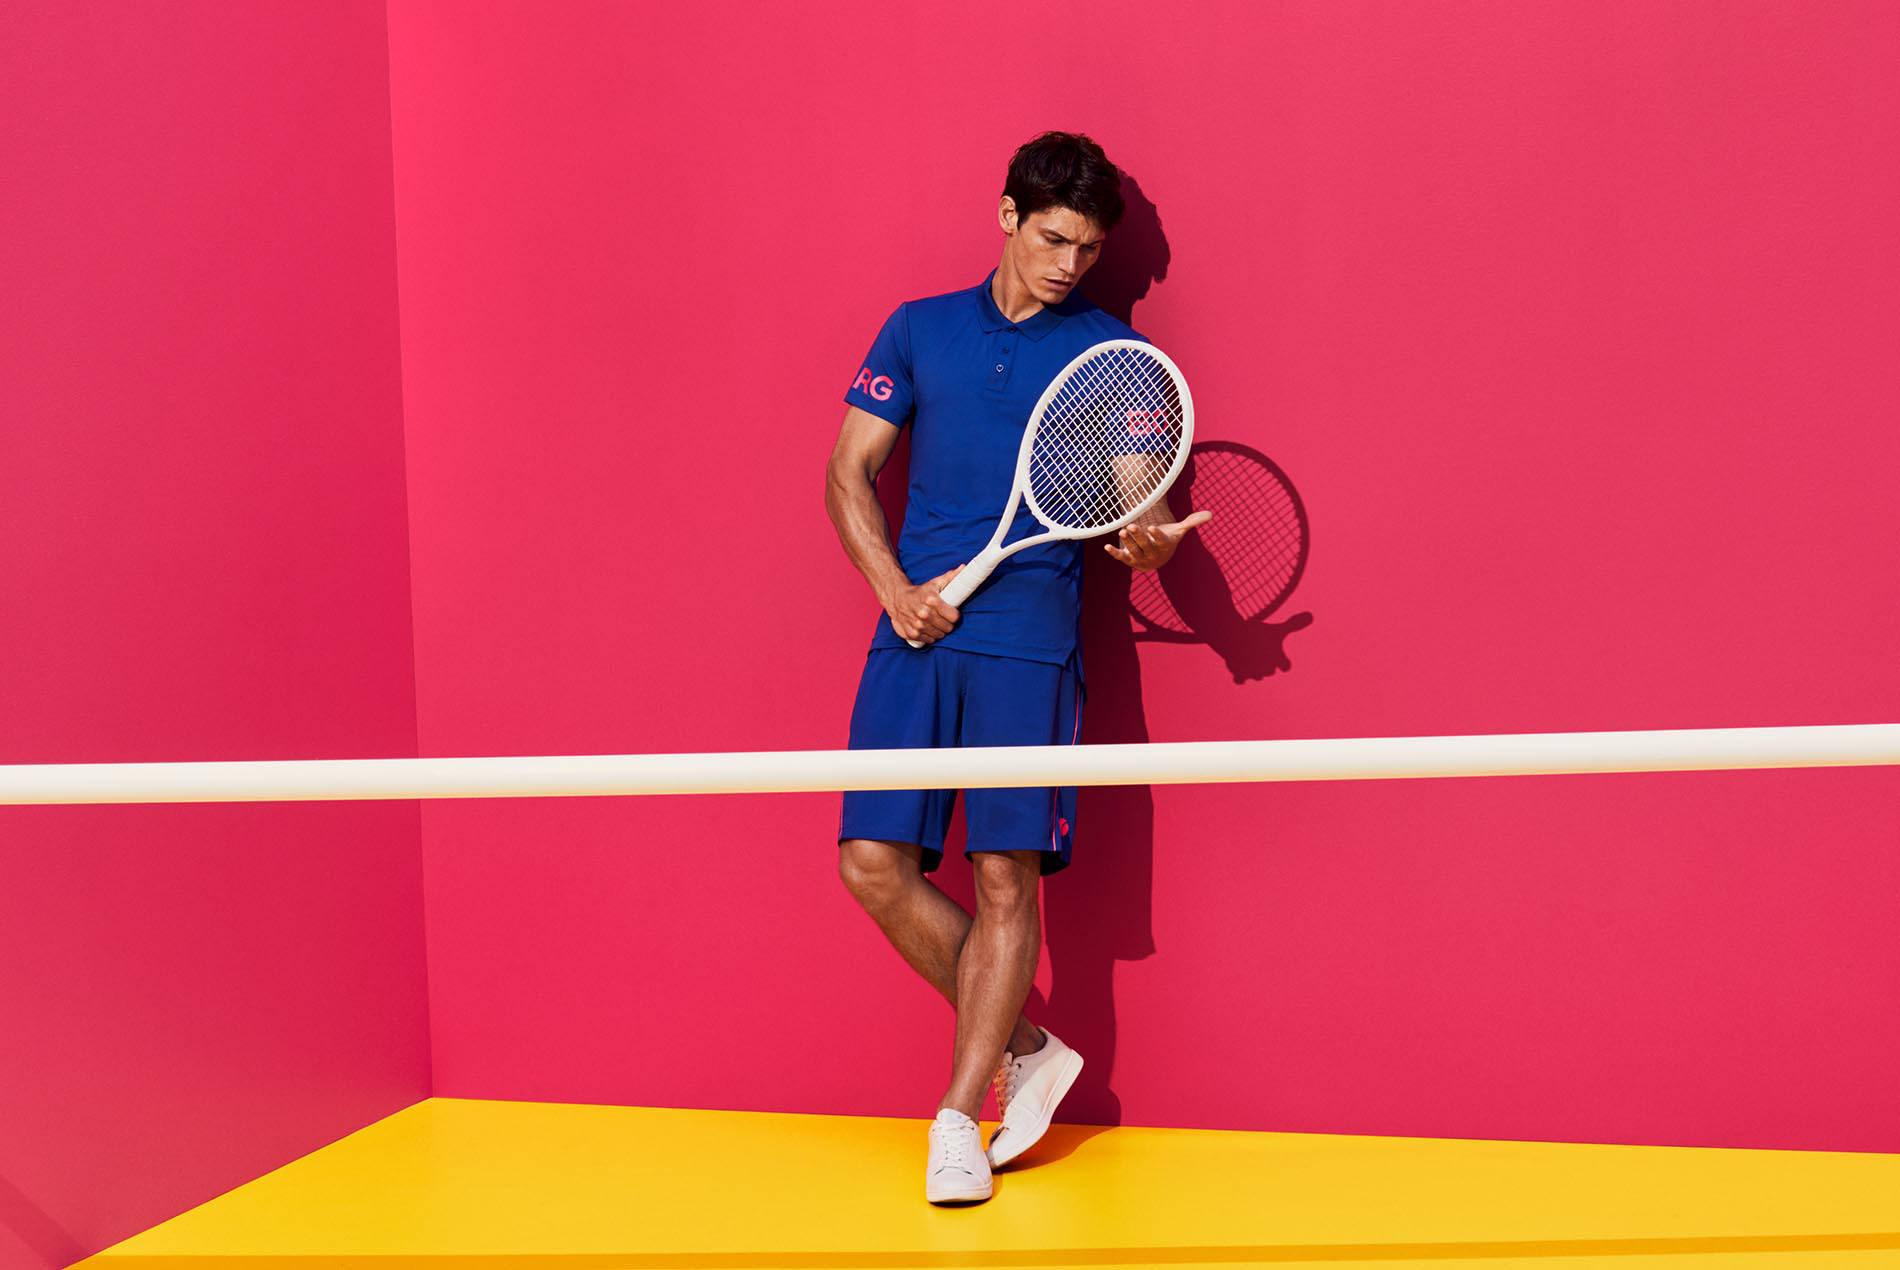 Björn Borg tennis